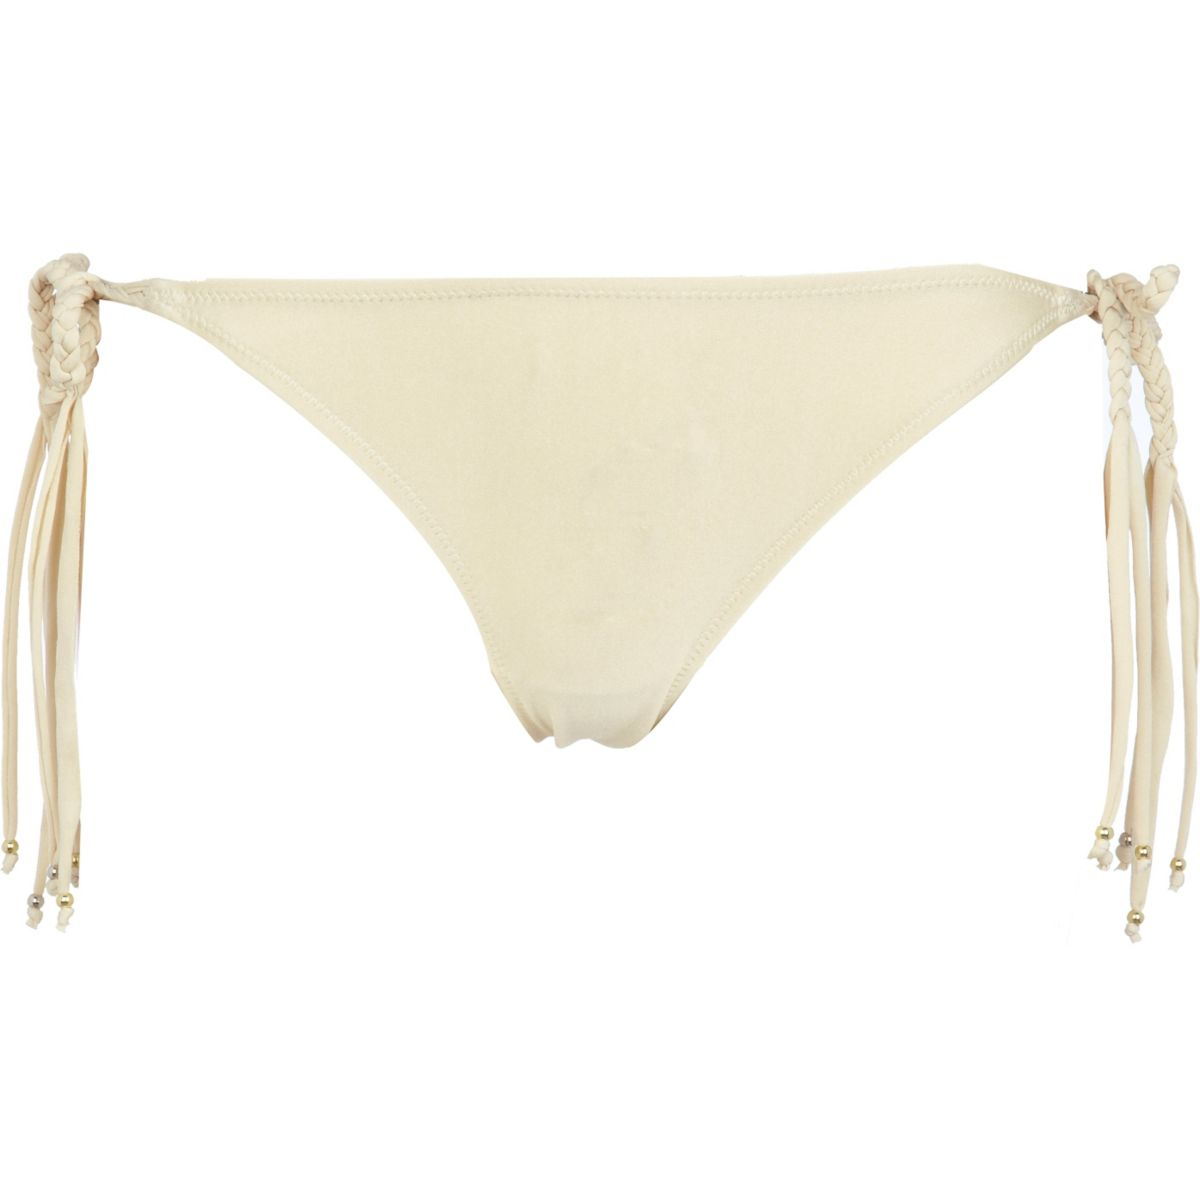 Gold macrame bikini briefs